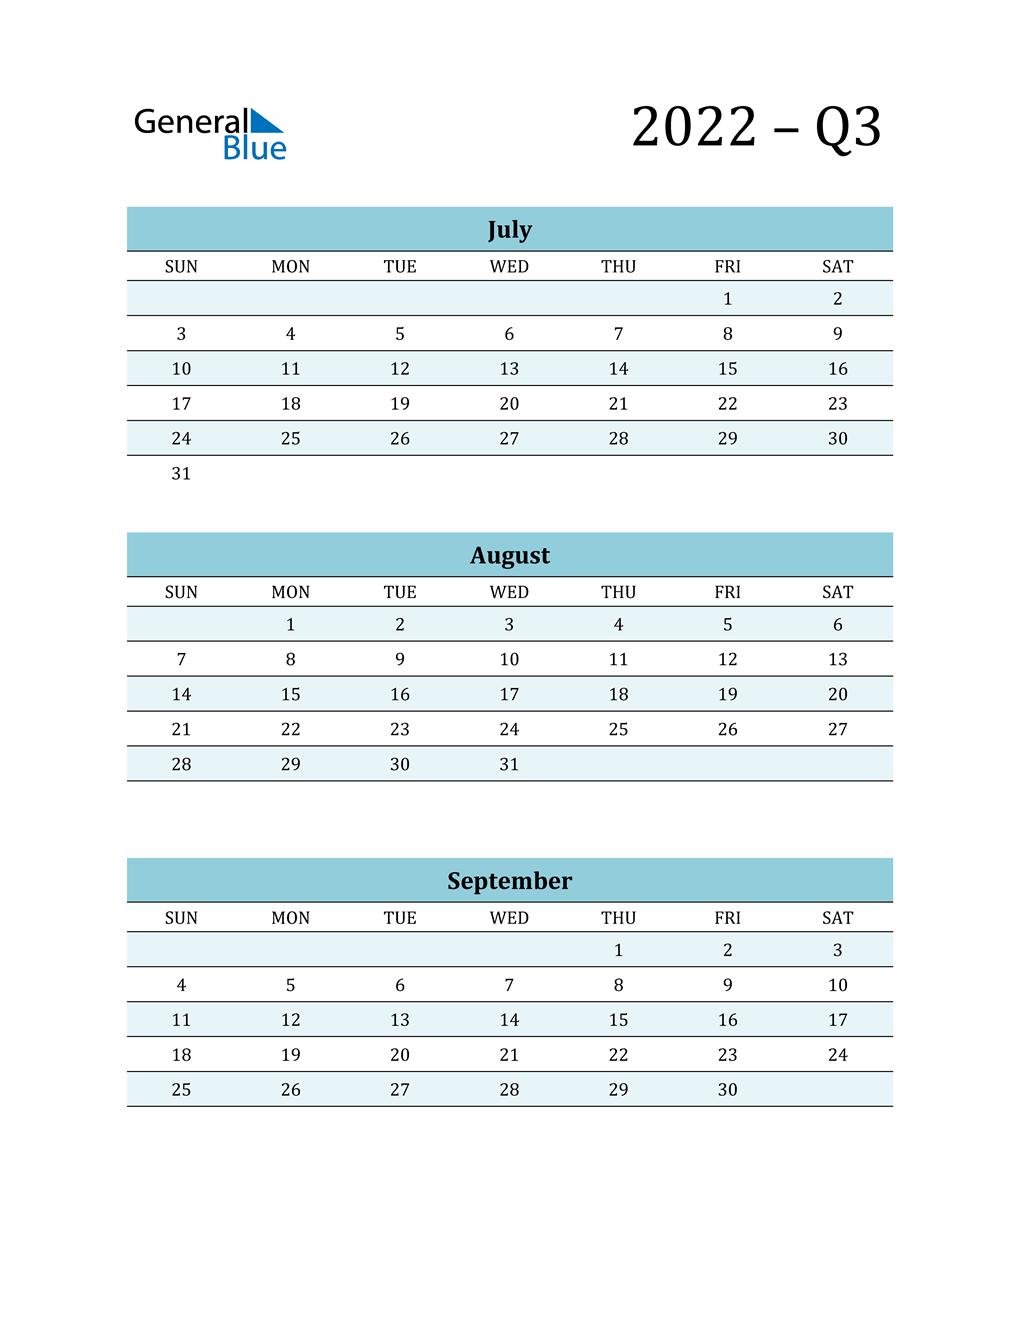 July, August, and September 2022 Calendar